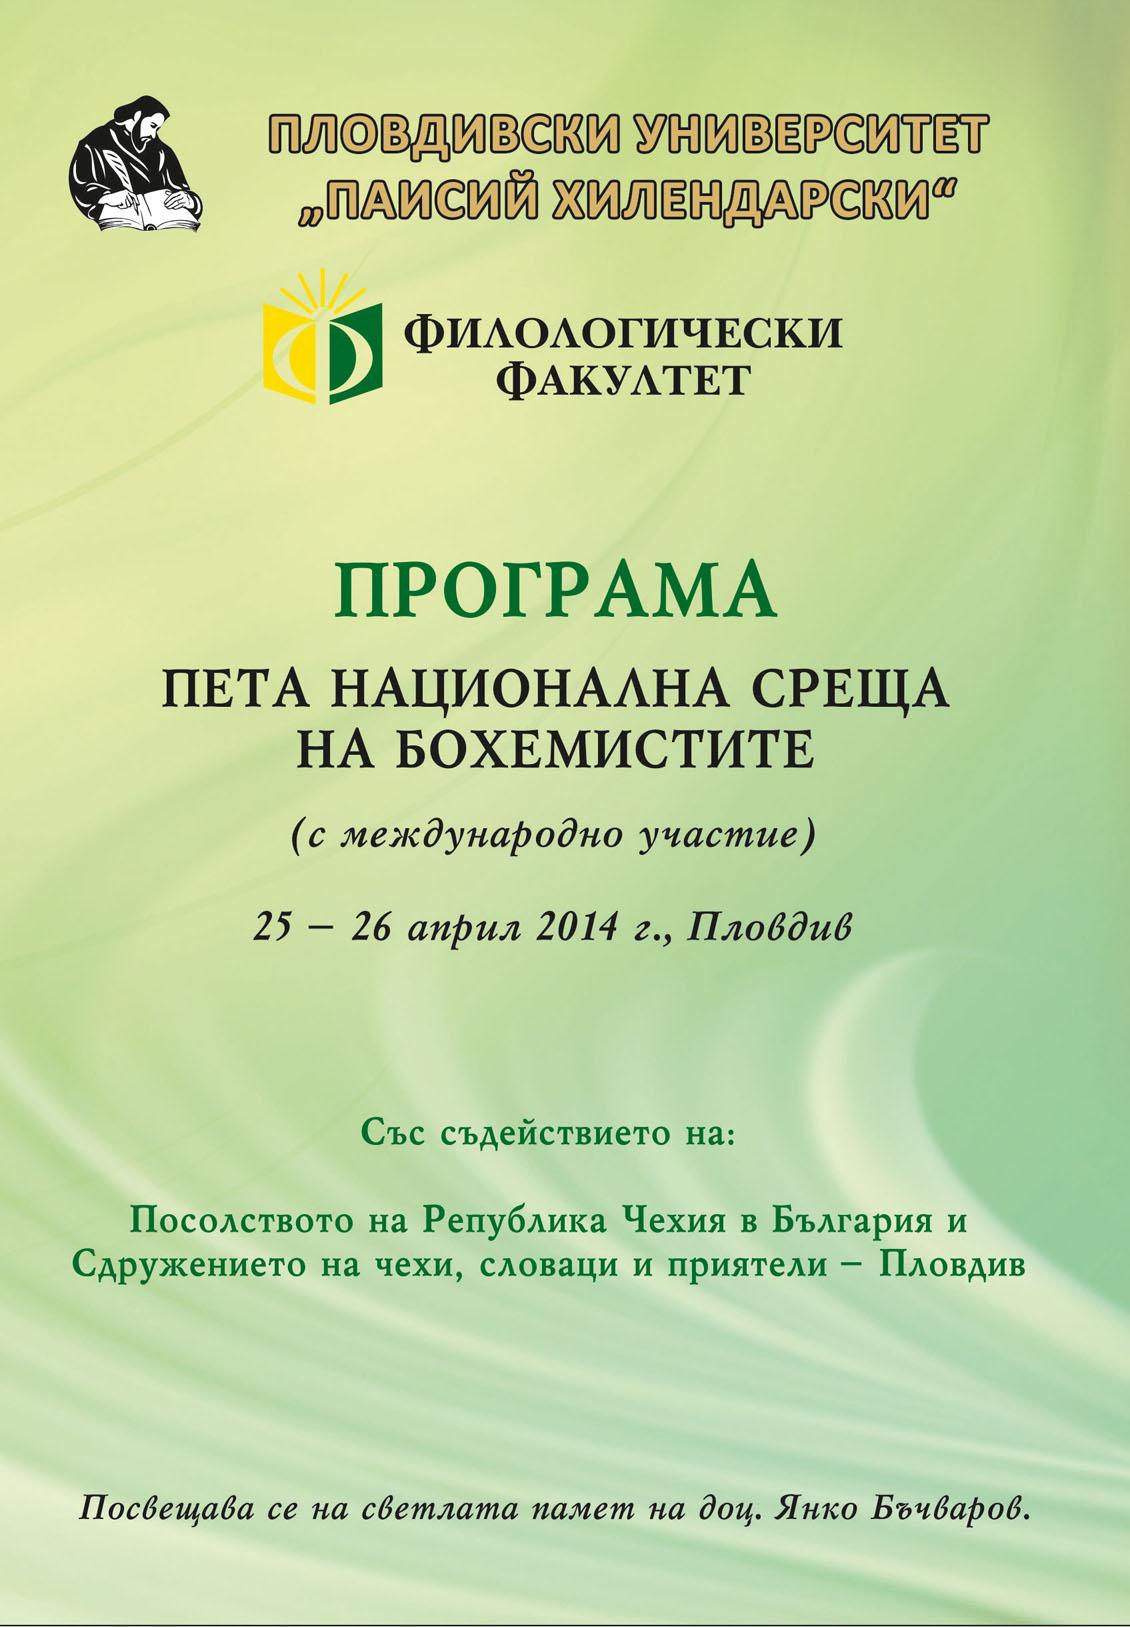 Programa-Filologia-A5-1